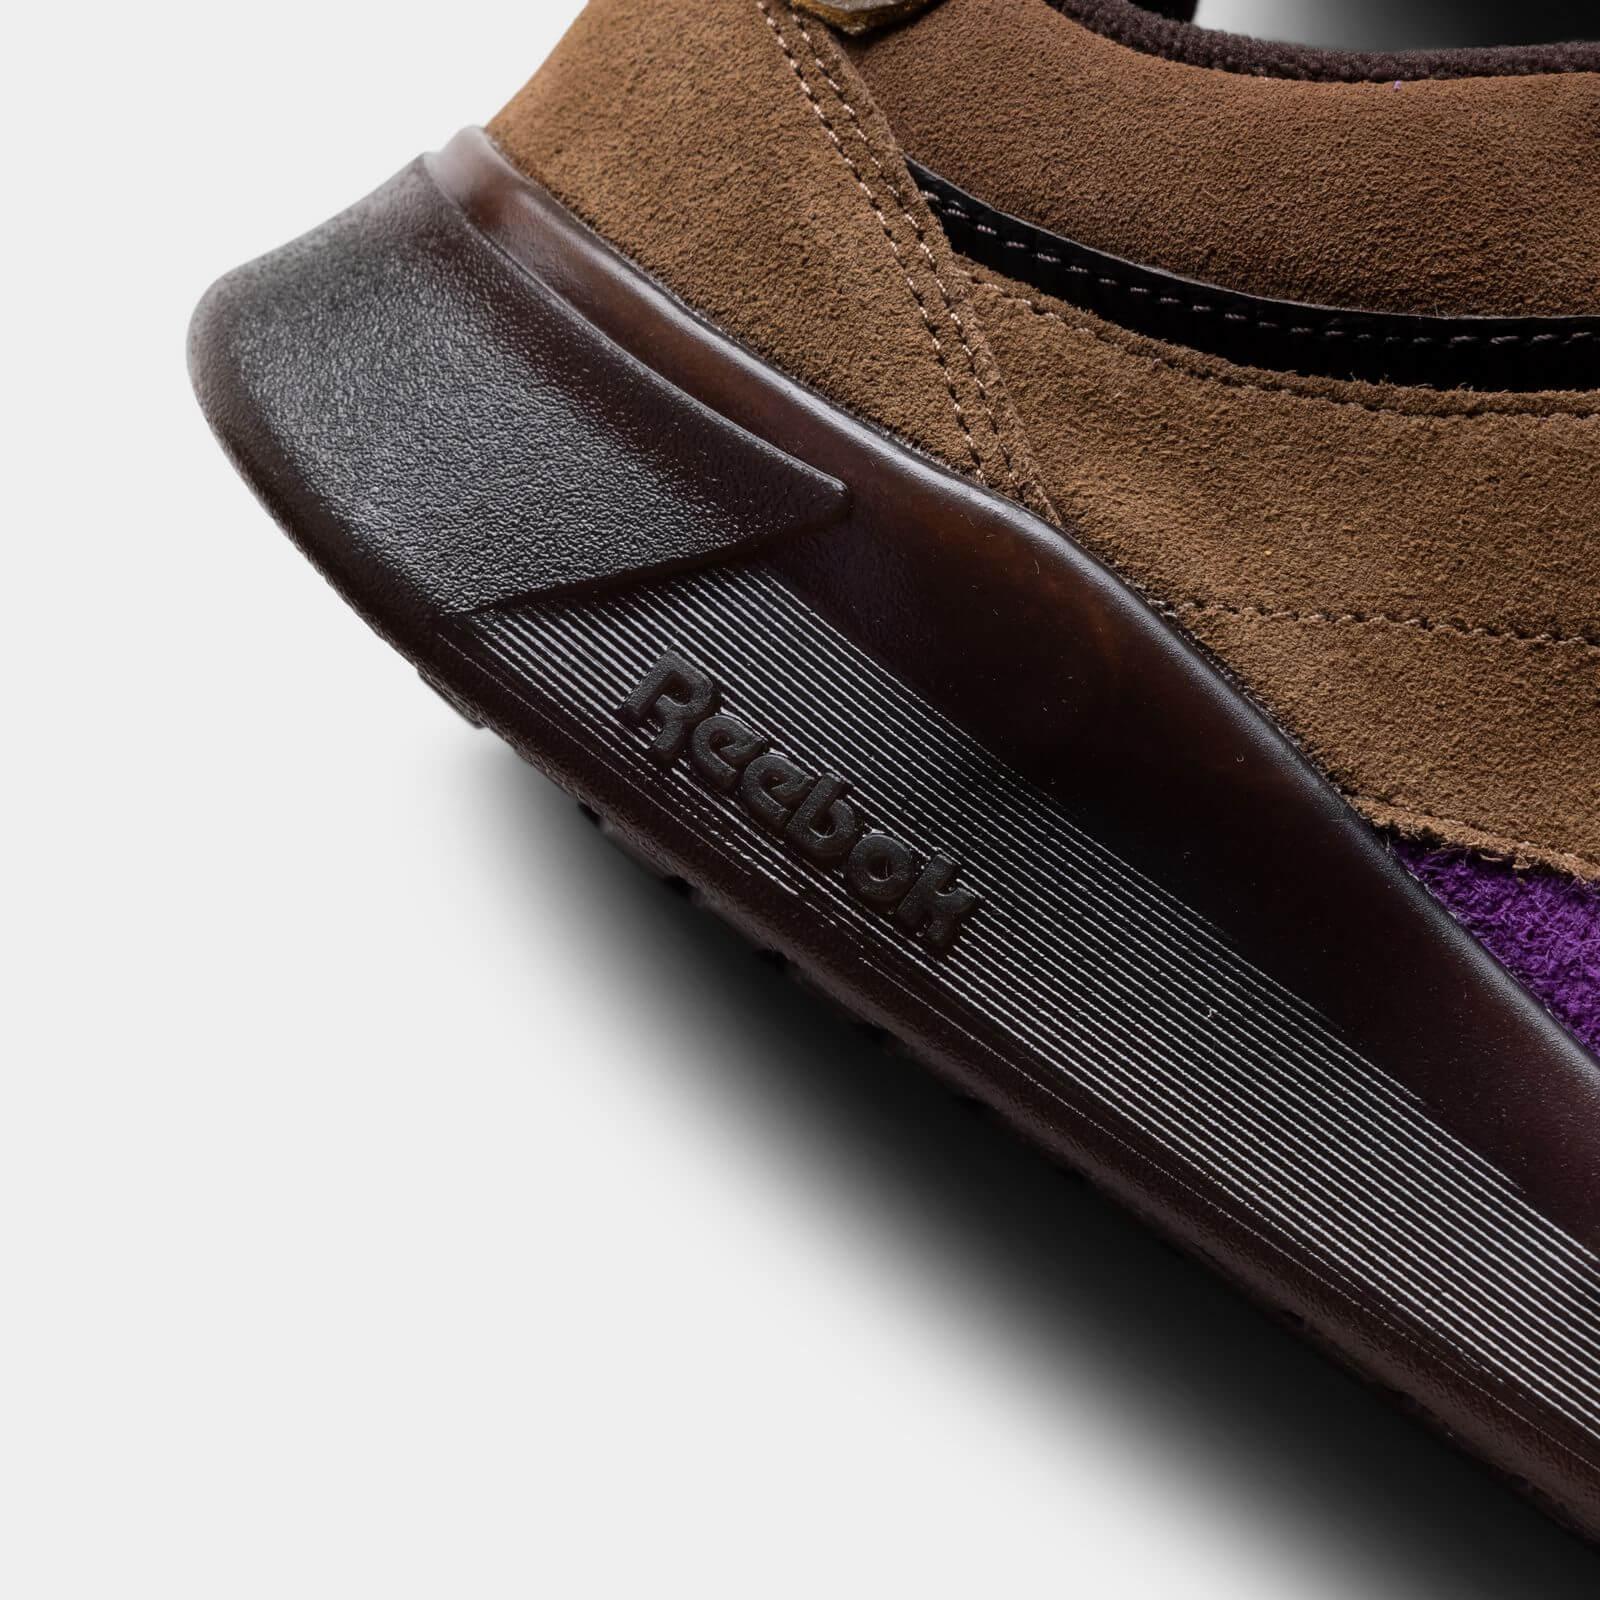 midsole heel details - Reebok x Bodega - Club C Legacy - just brown/extreme purple/earth - H03360